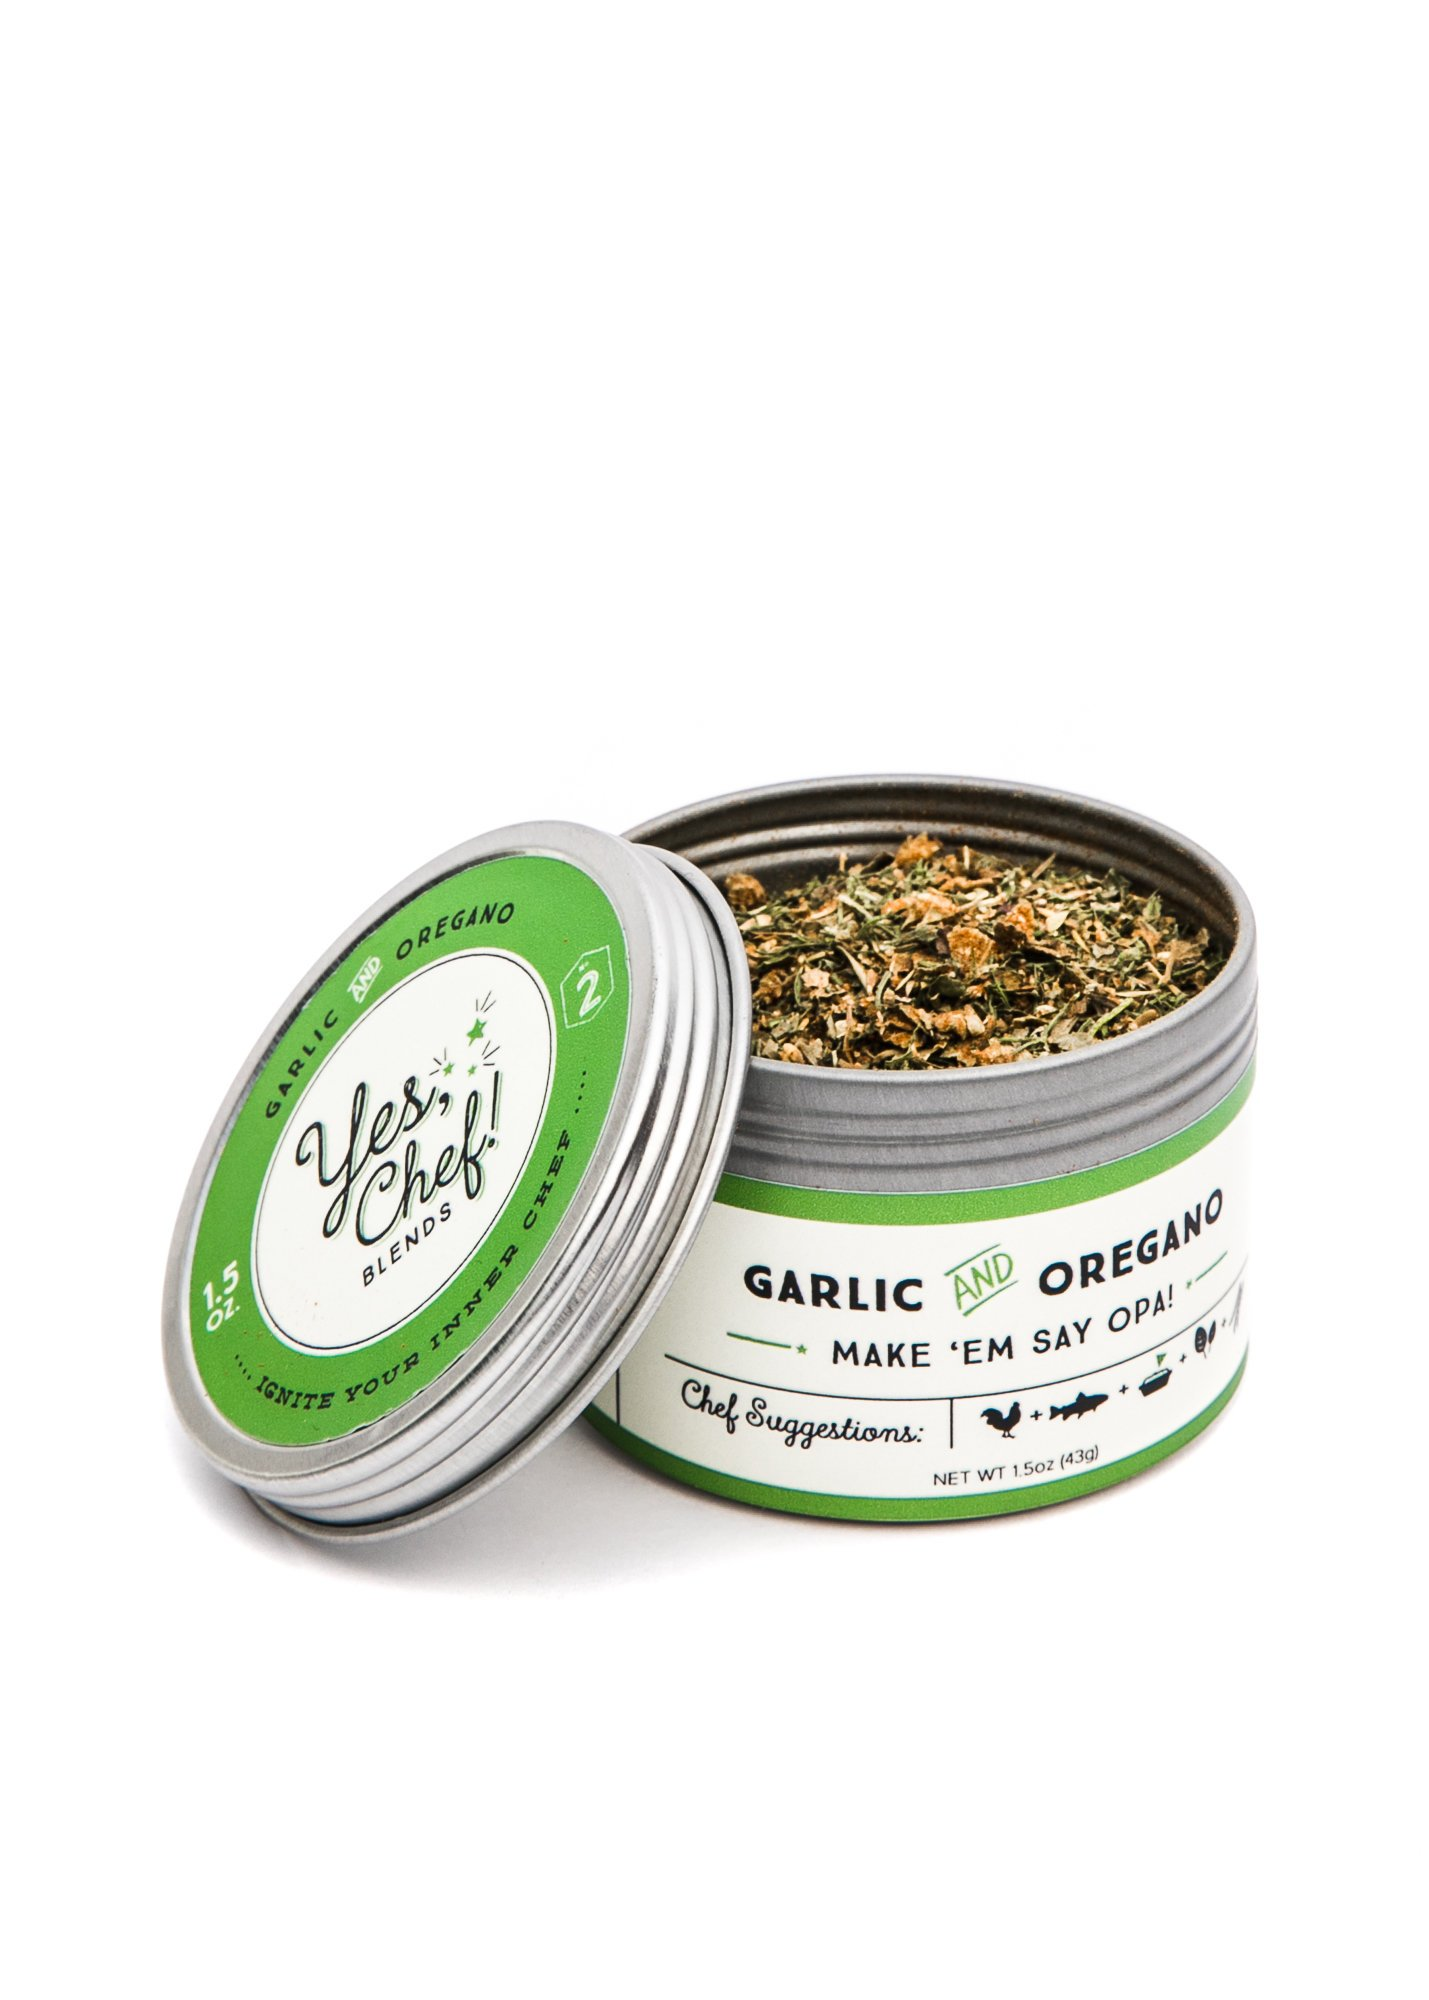 #1 Spice Blend - Make 'Em Say Opa! Greek Seasoning - Sugar + Salt Free (4 Pack)